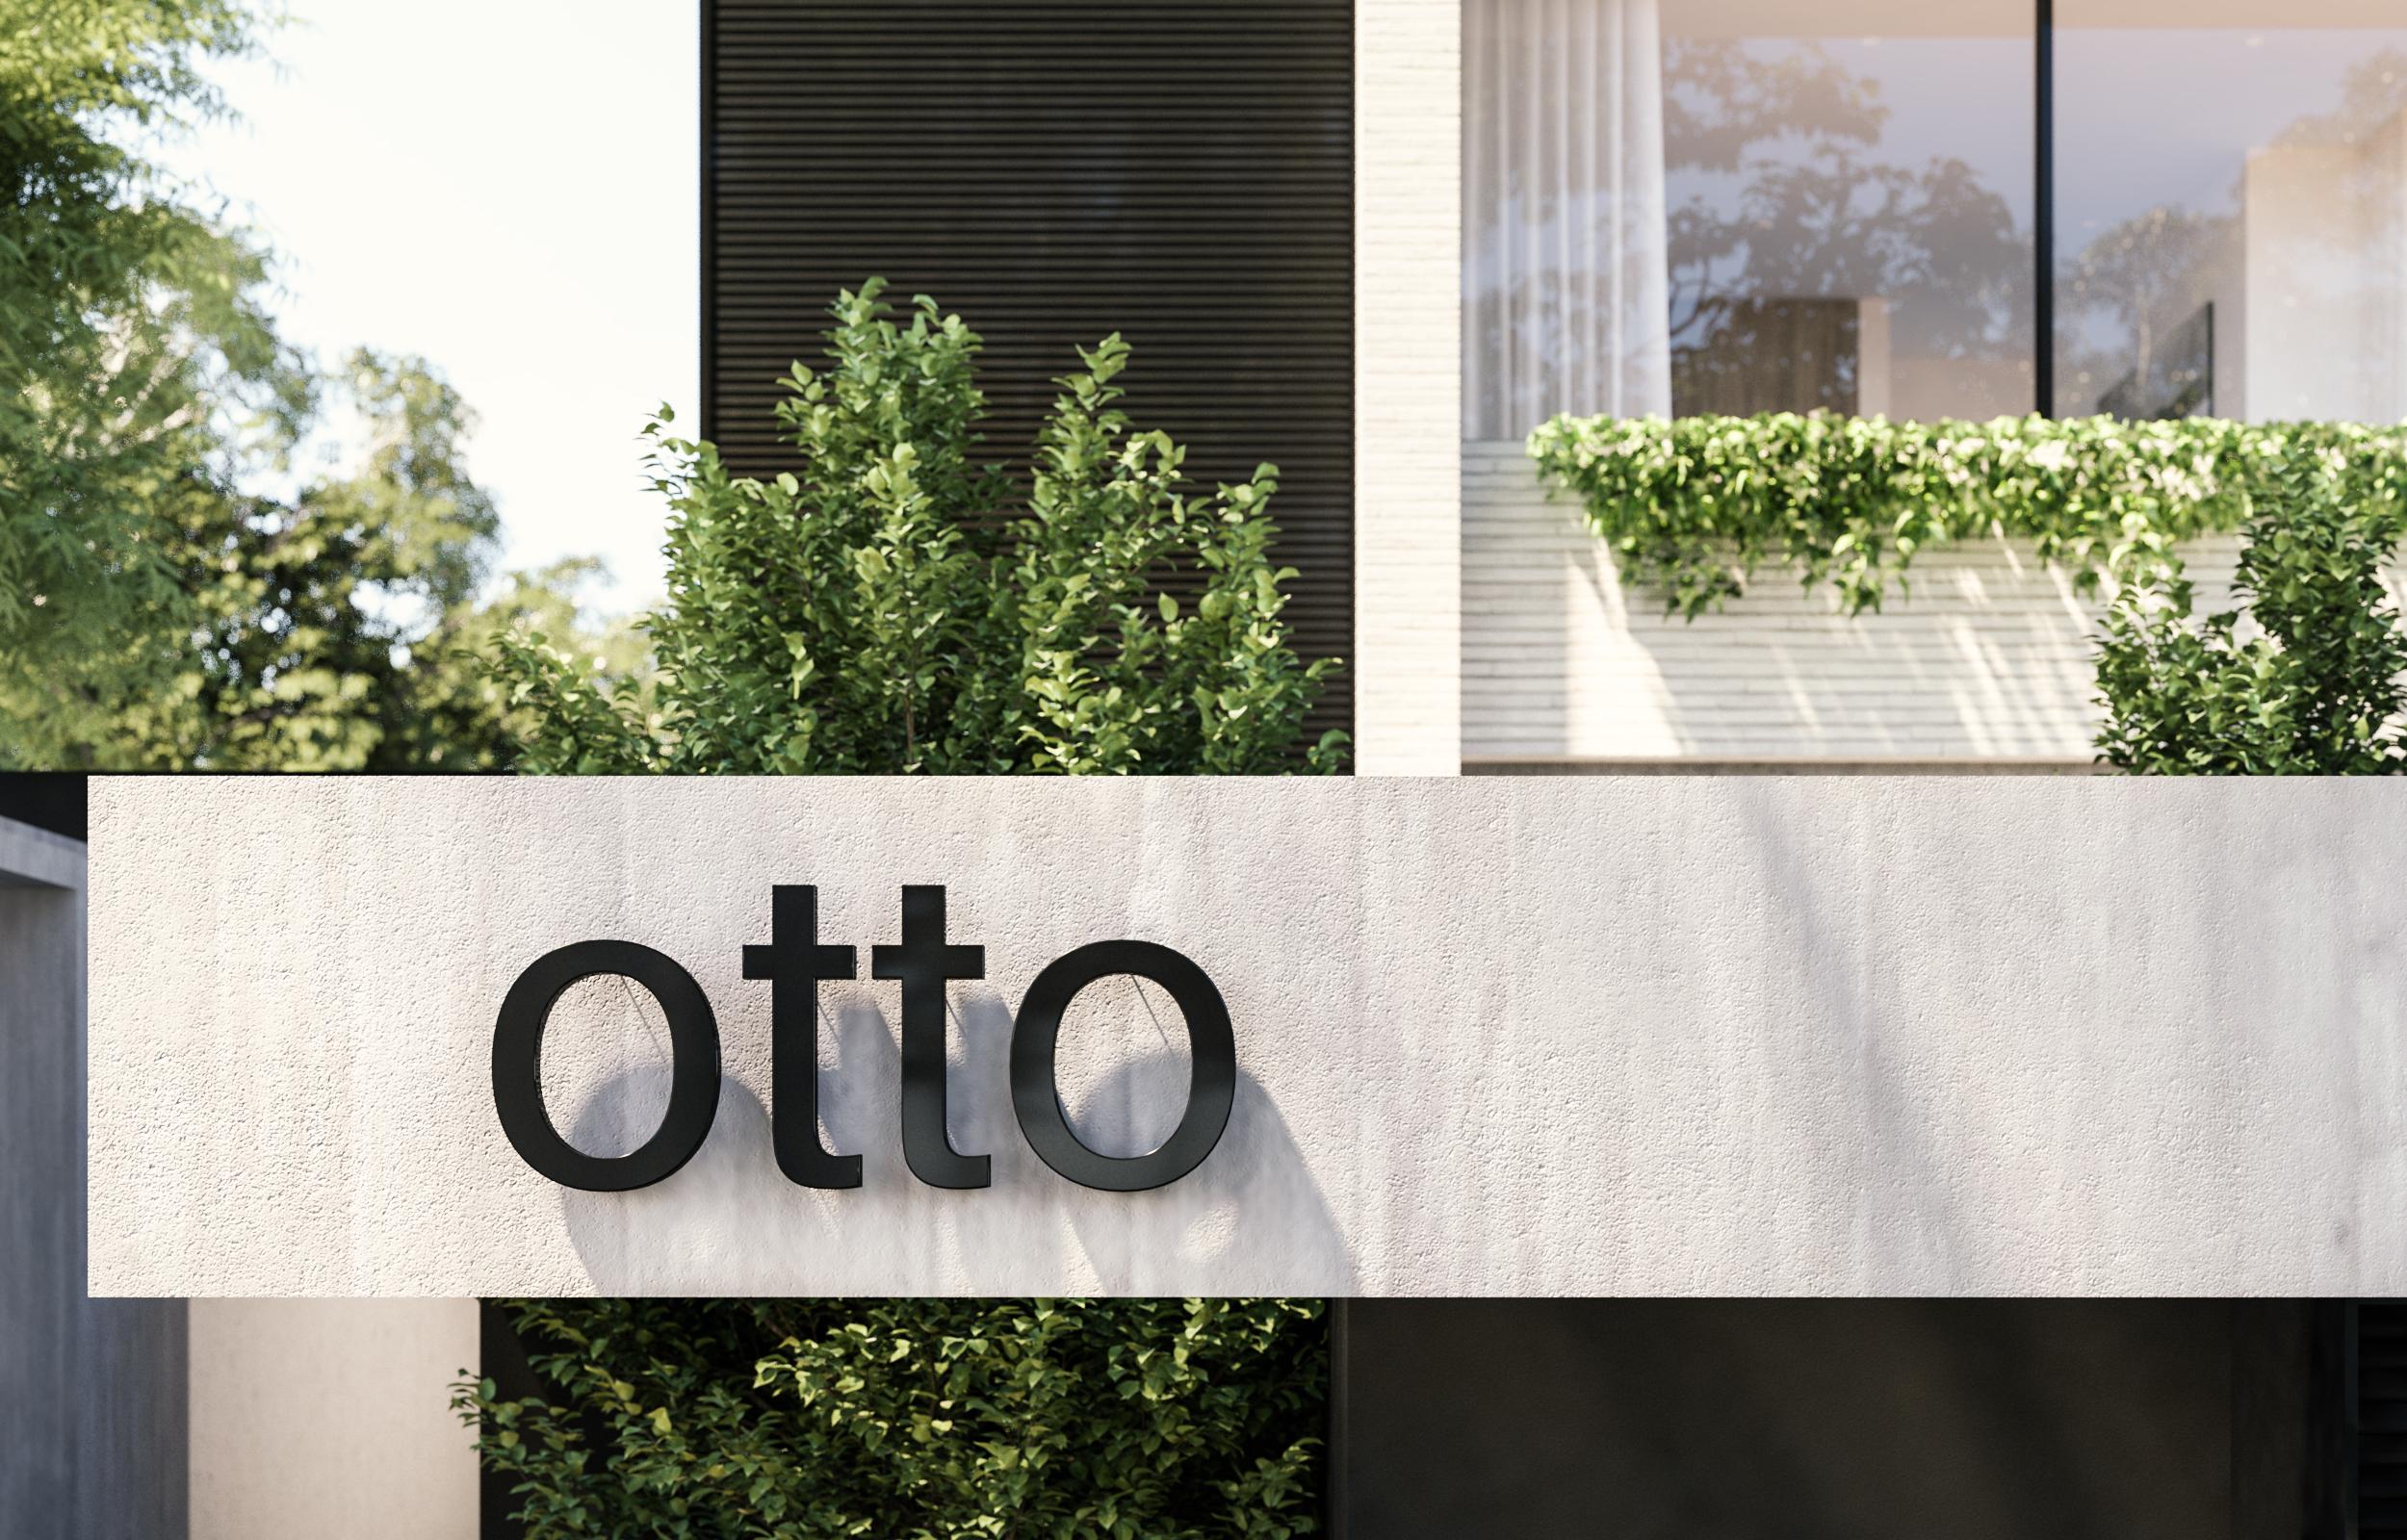 Otto - Exterior Streetscape Detail DoF - Test 04_0006.jpg